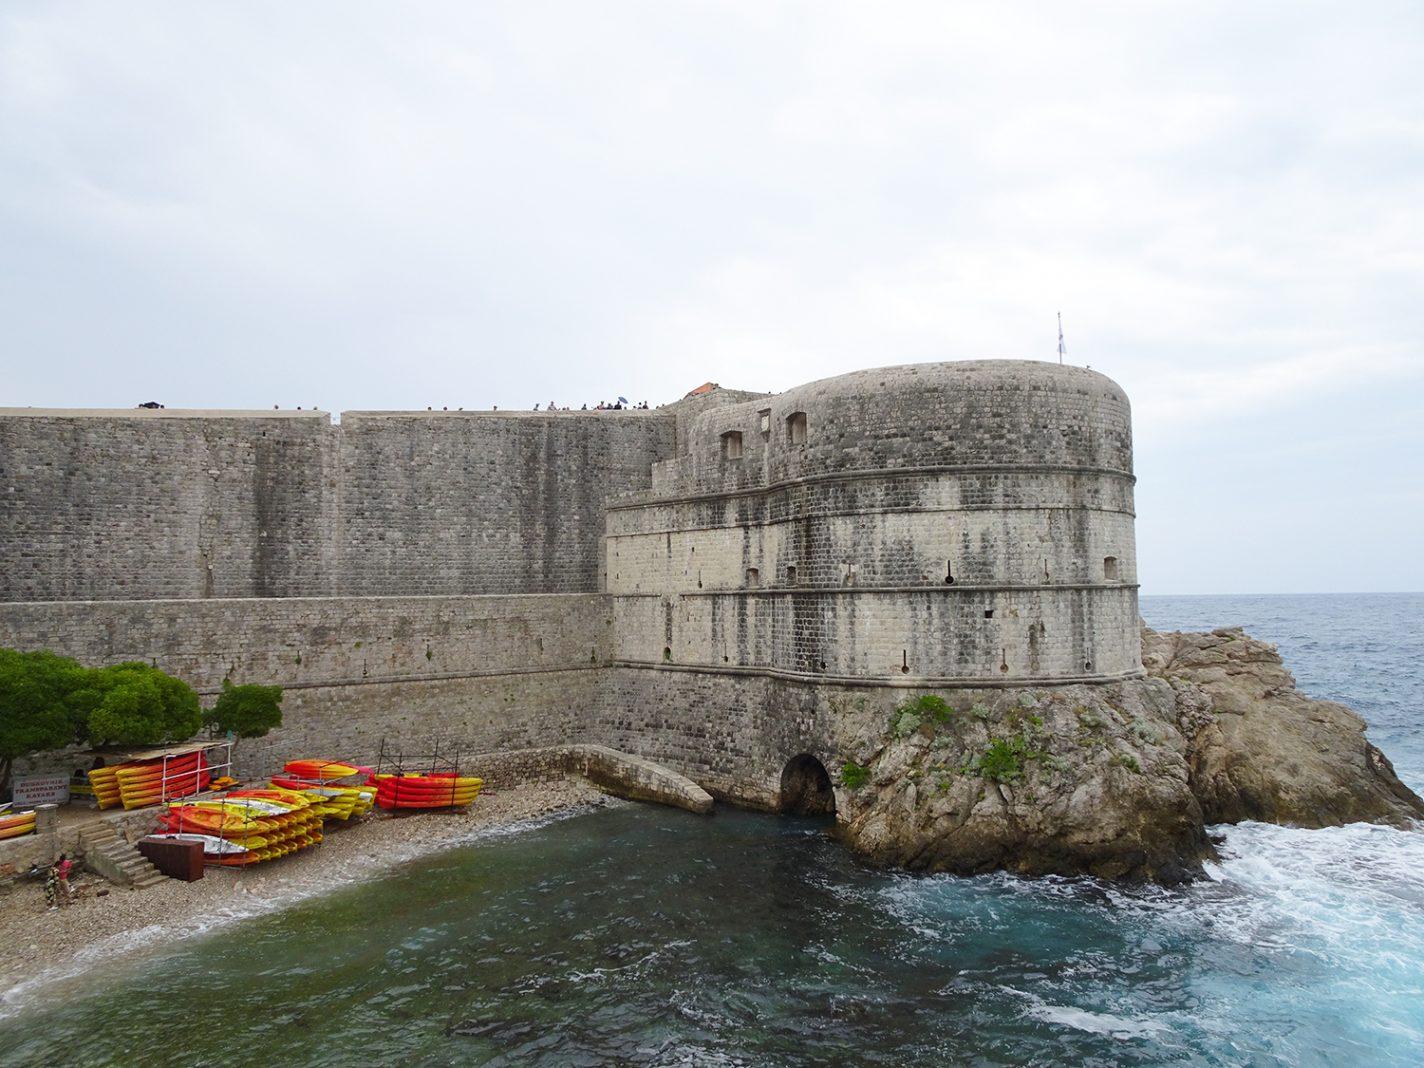 Stadsomwalling van Dubrovnik